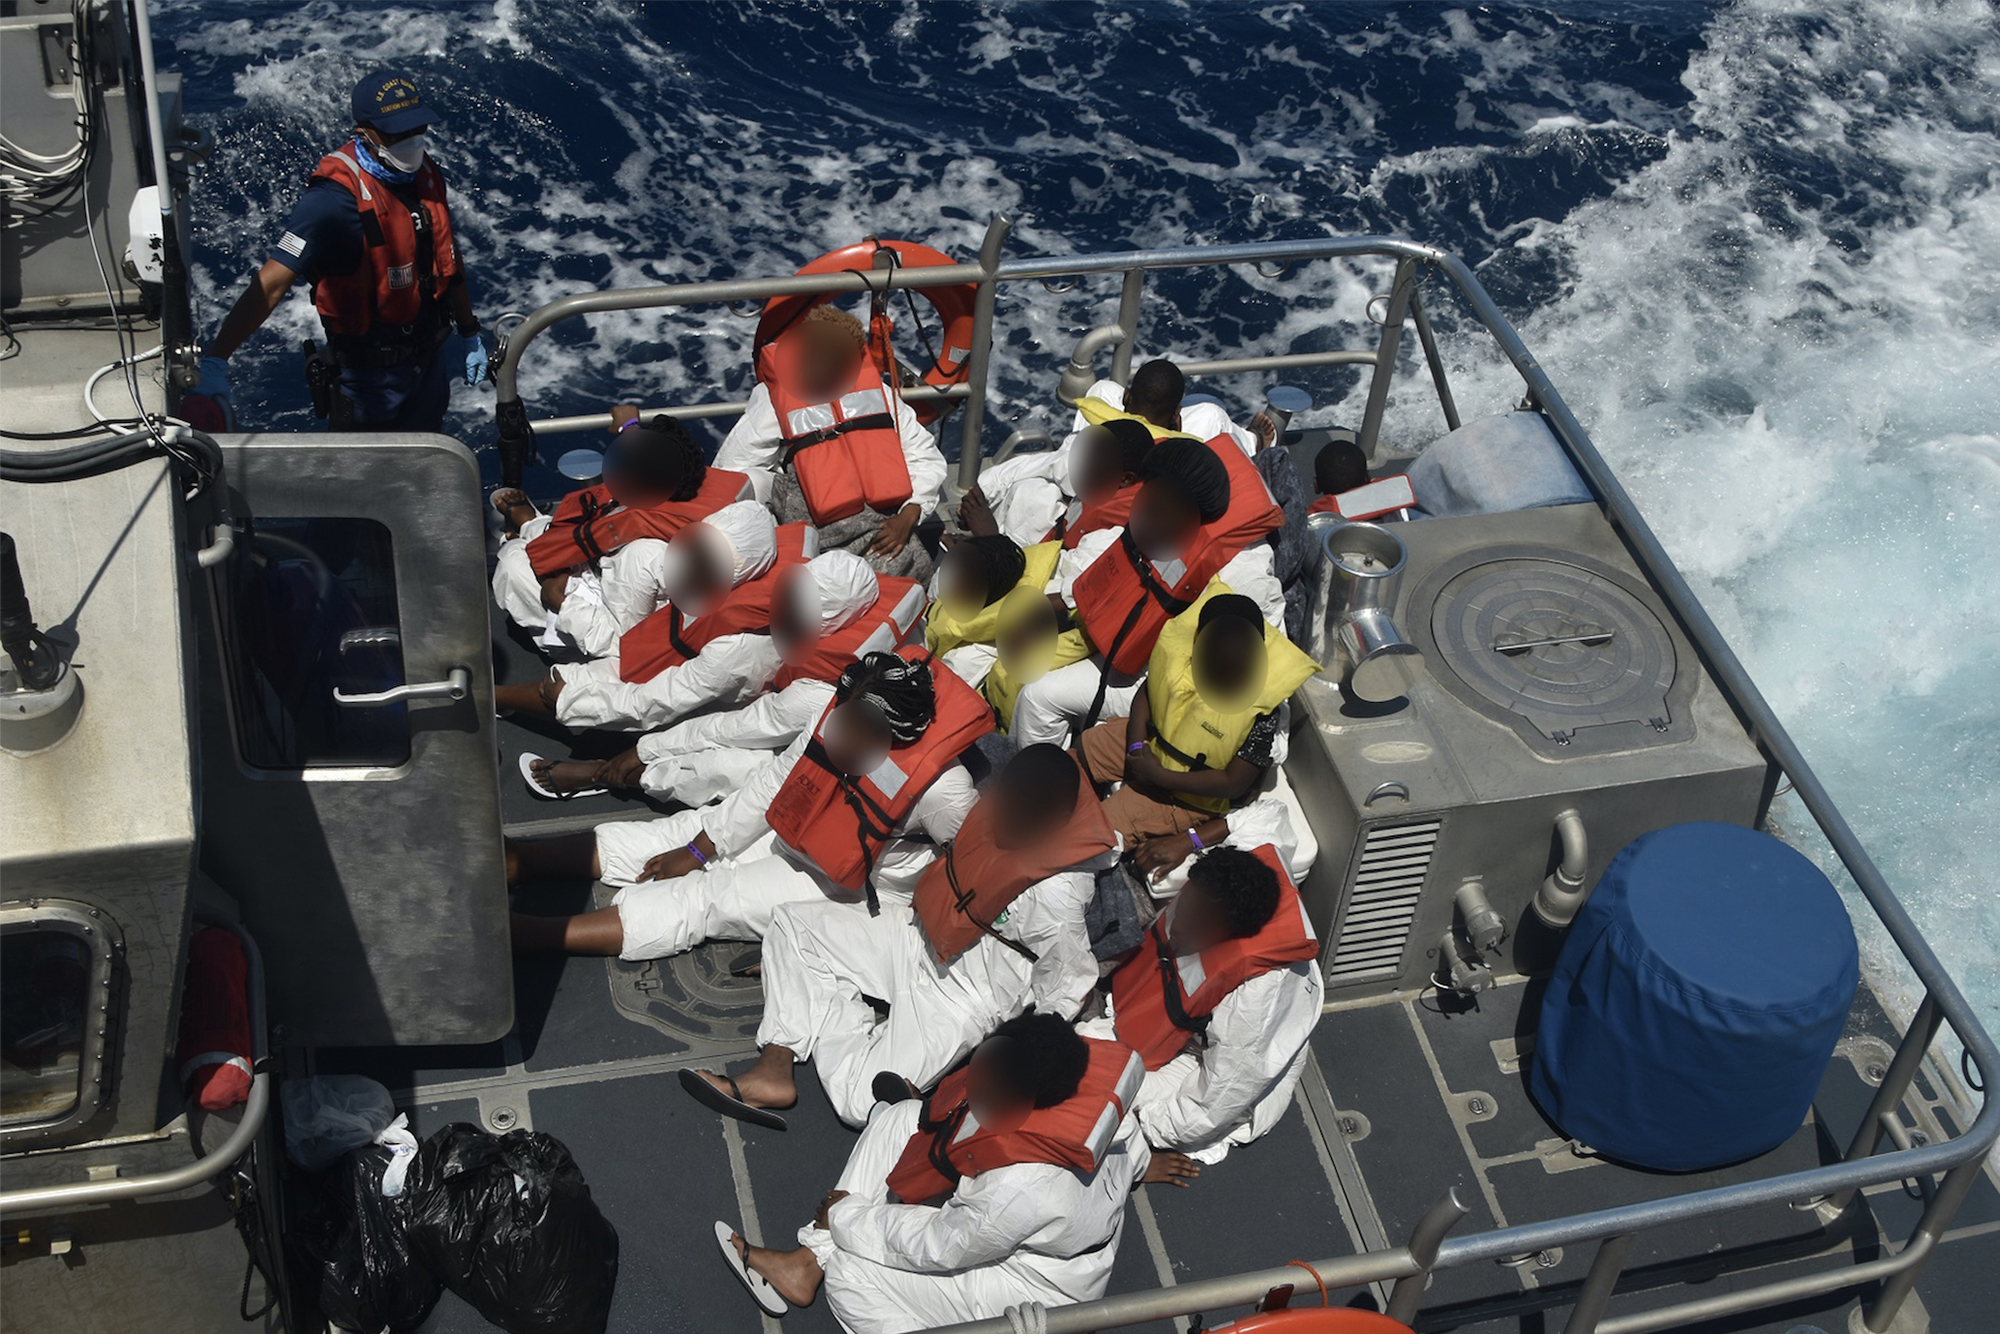 Coast Guard repatriates 74 migrants from 2 interdictions to Bahamas